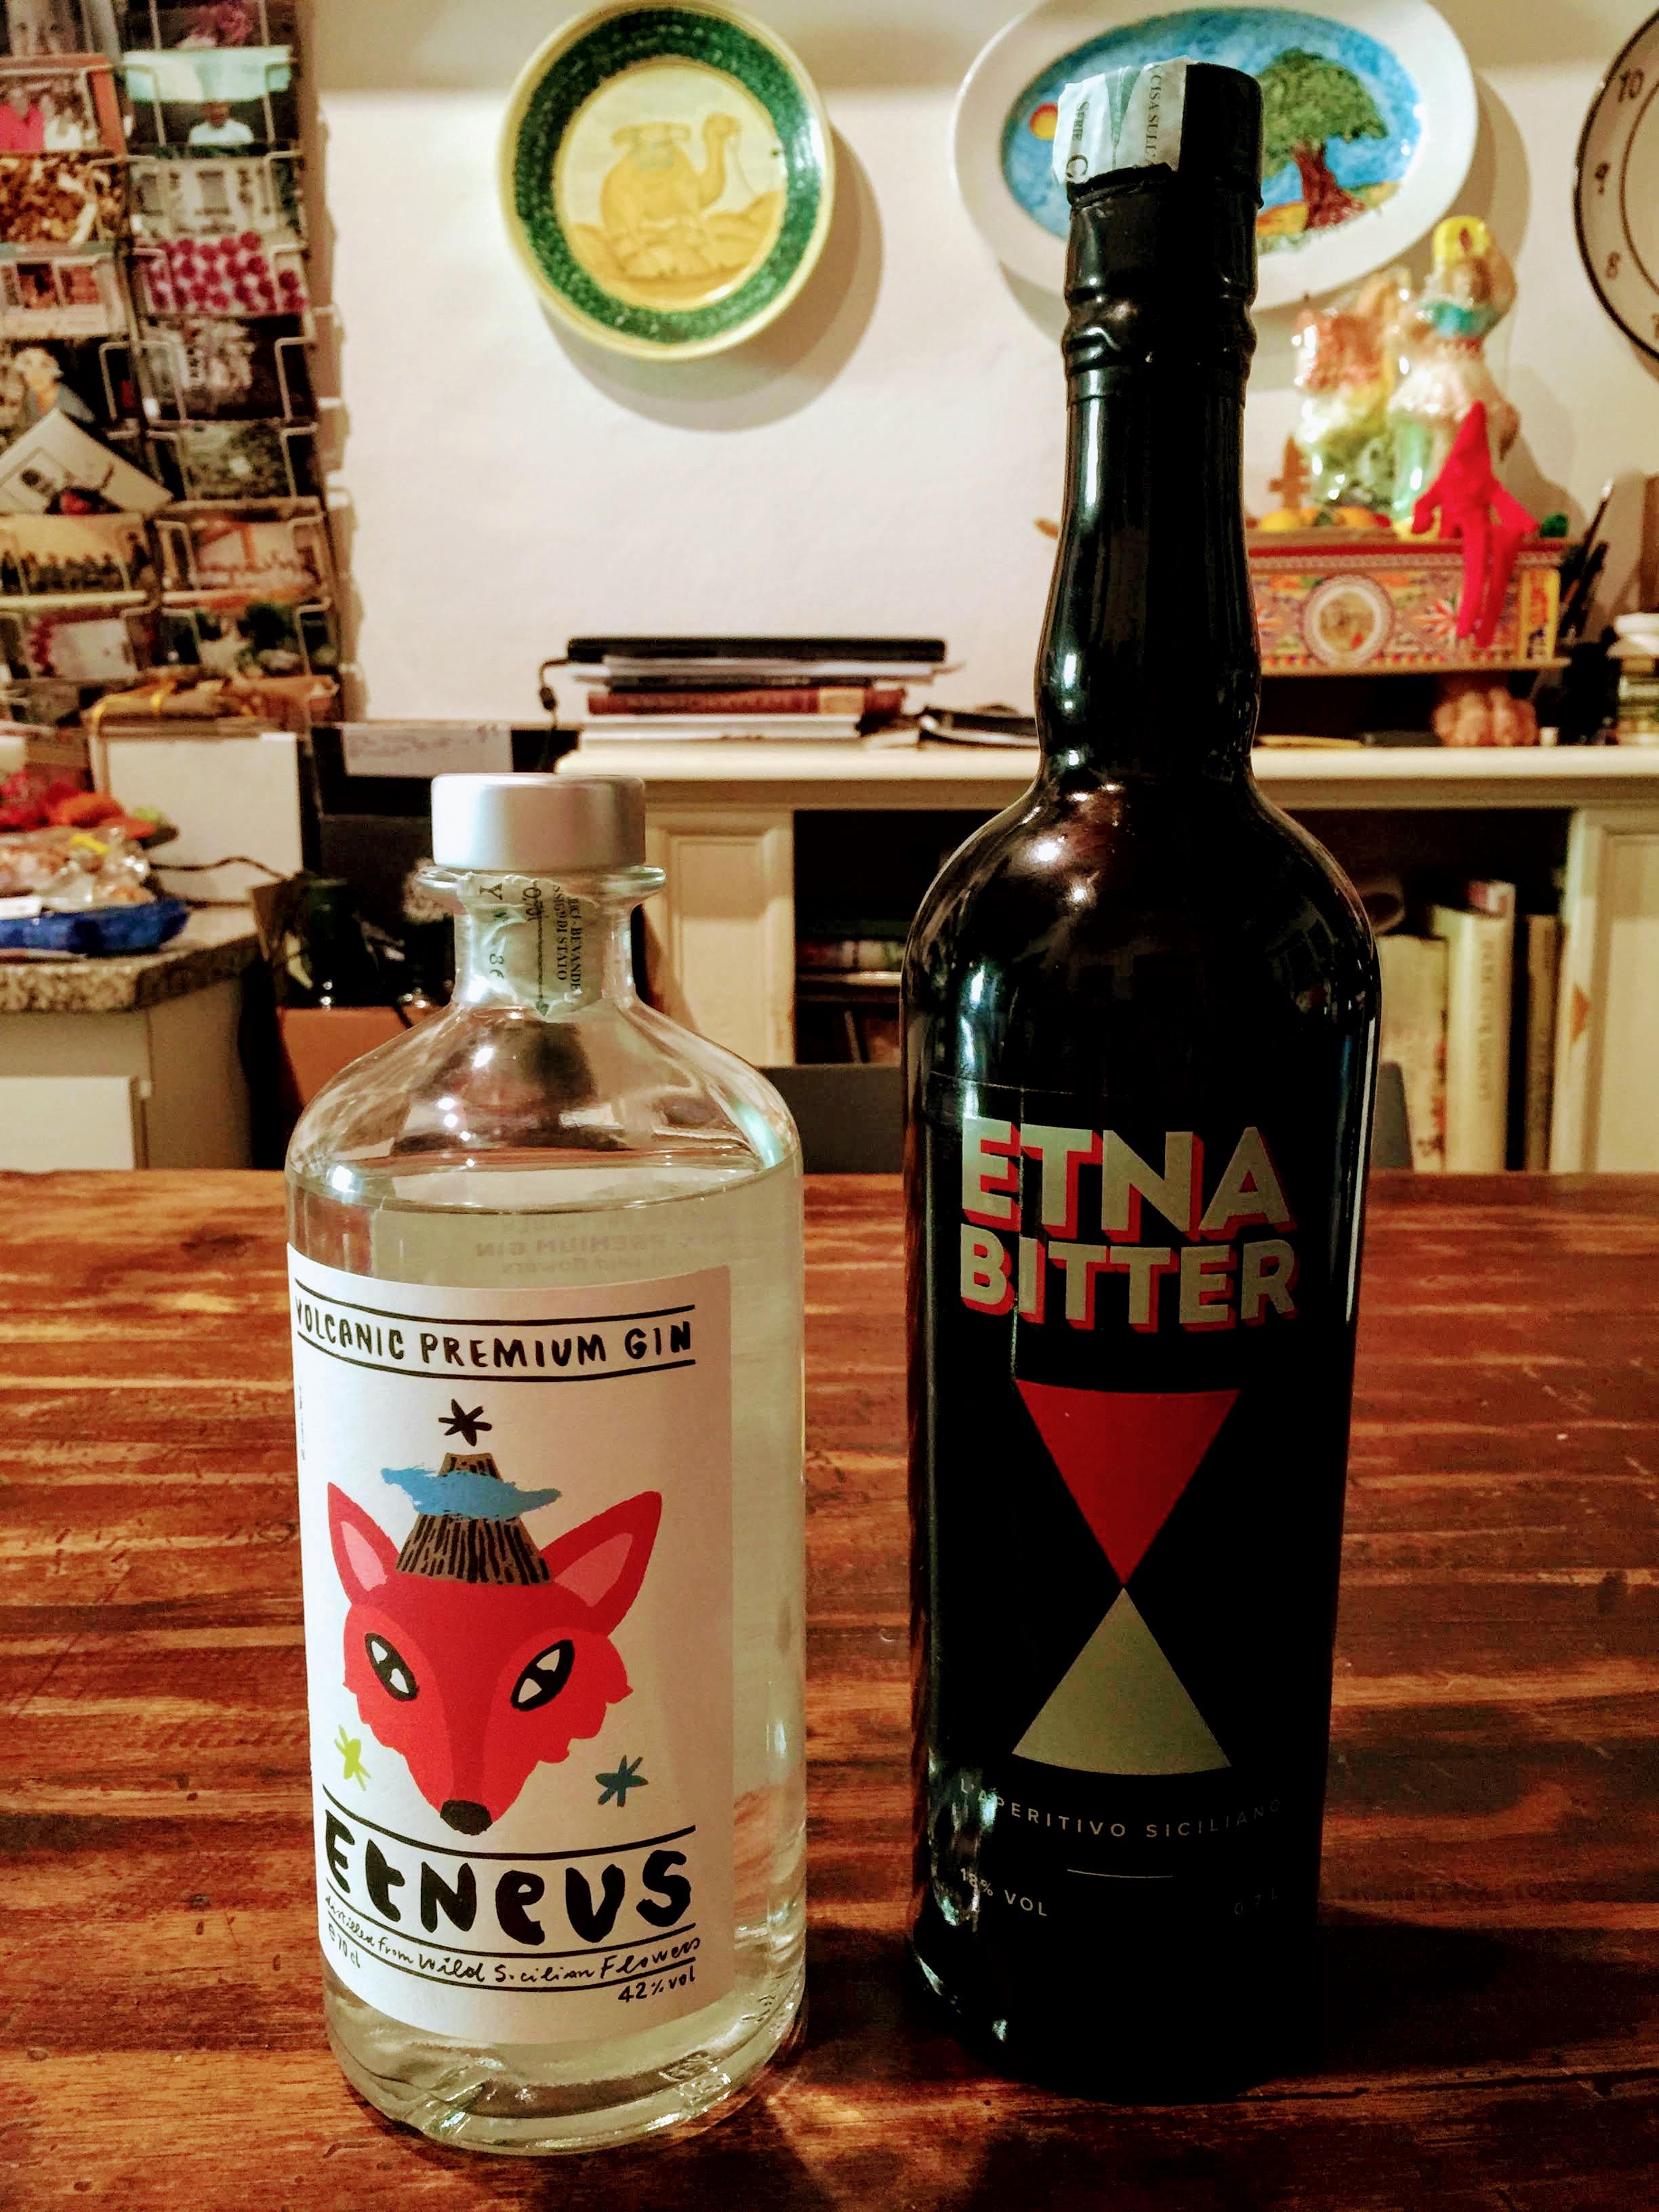 Etneus Volcanic Gin  and  Etna Bitter